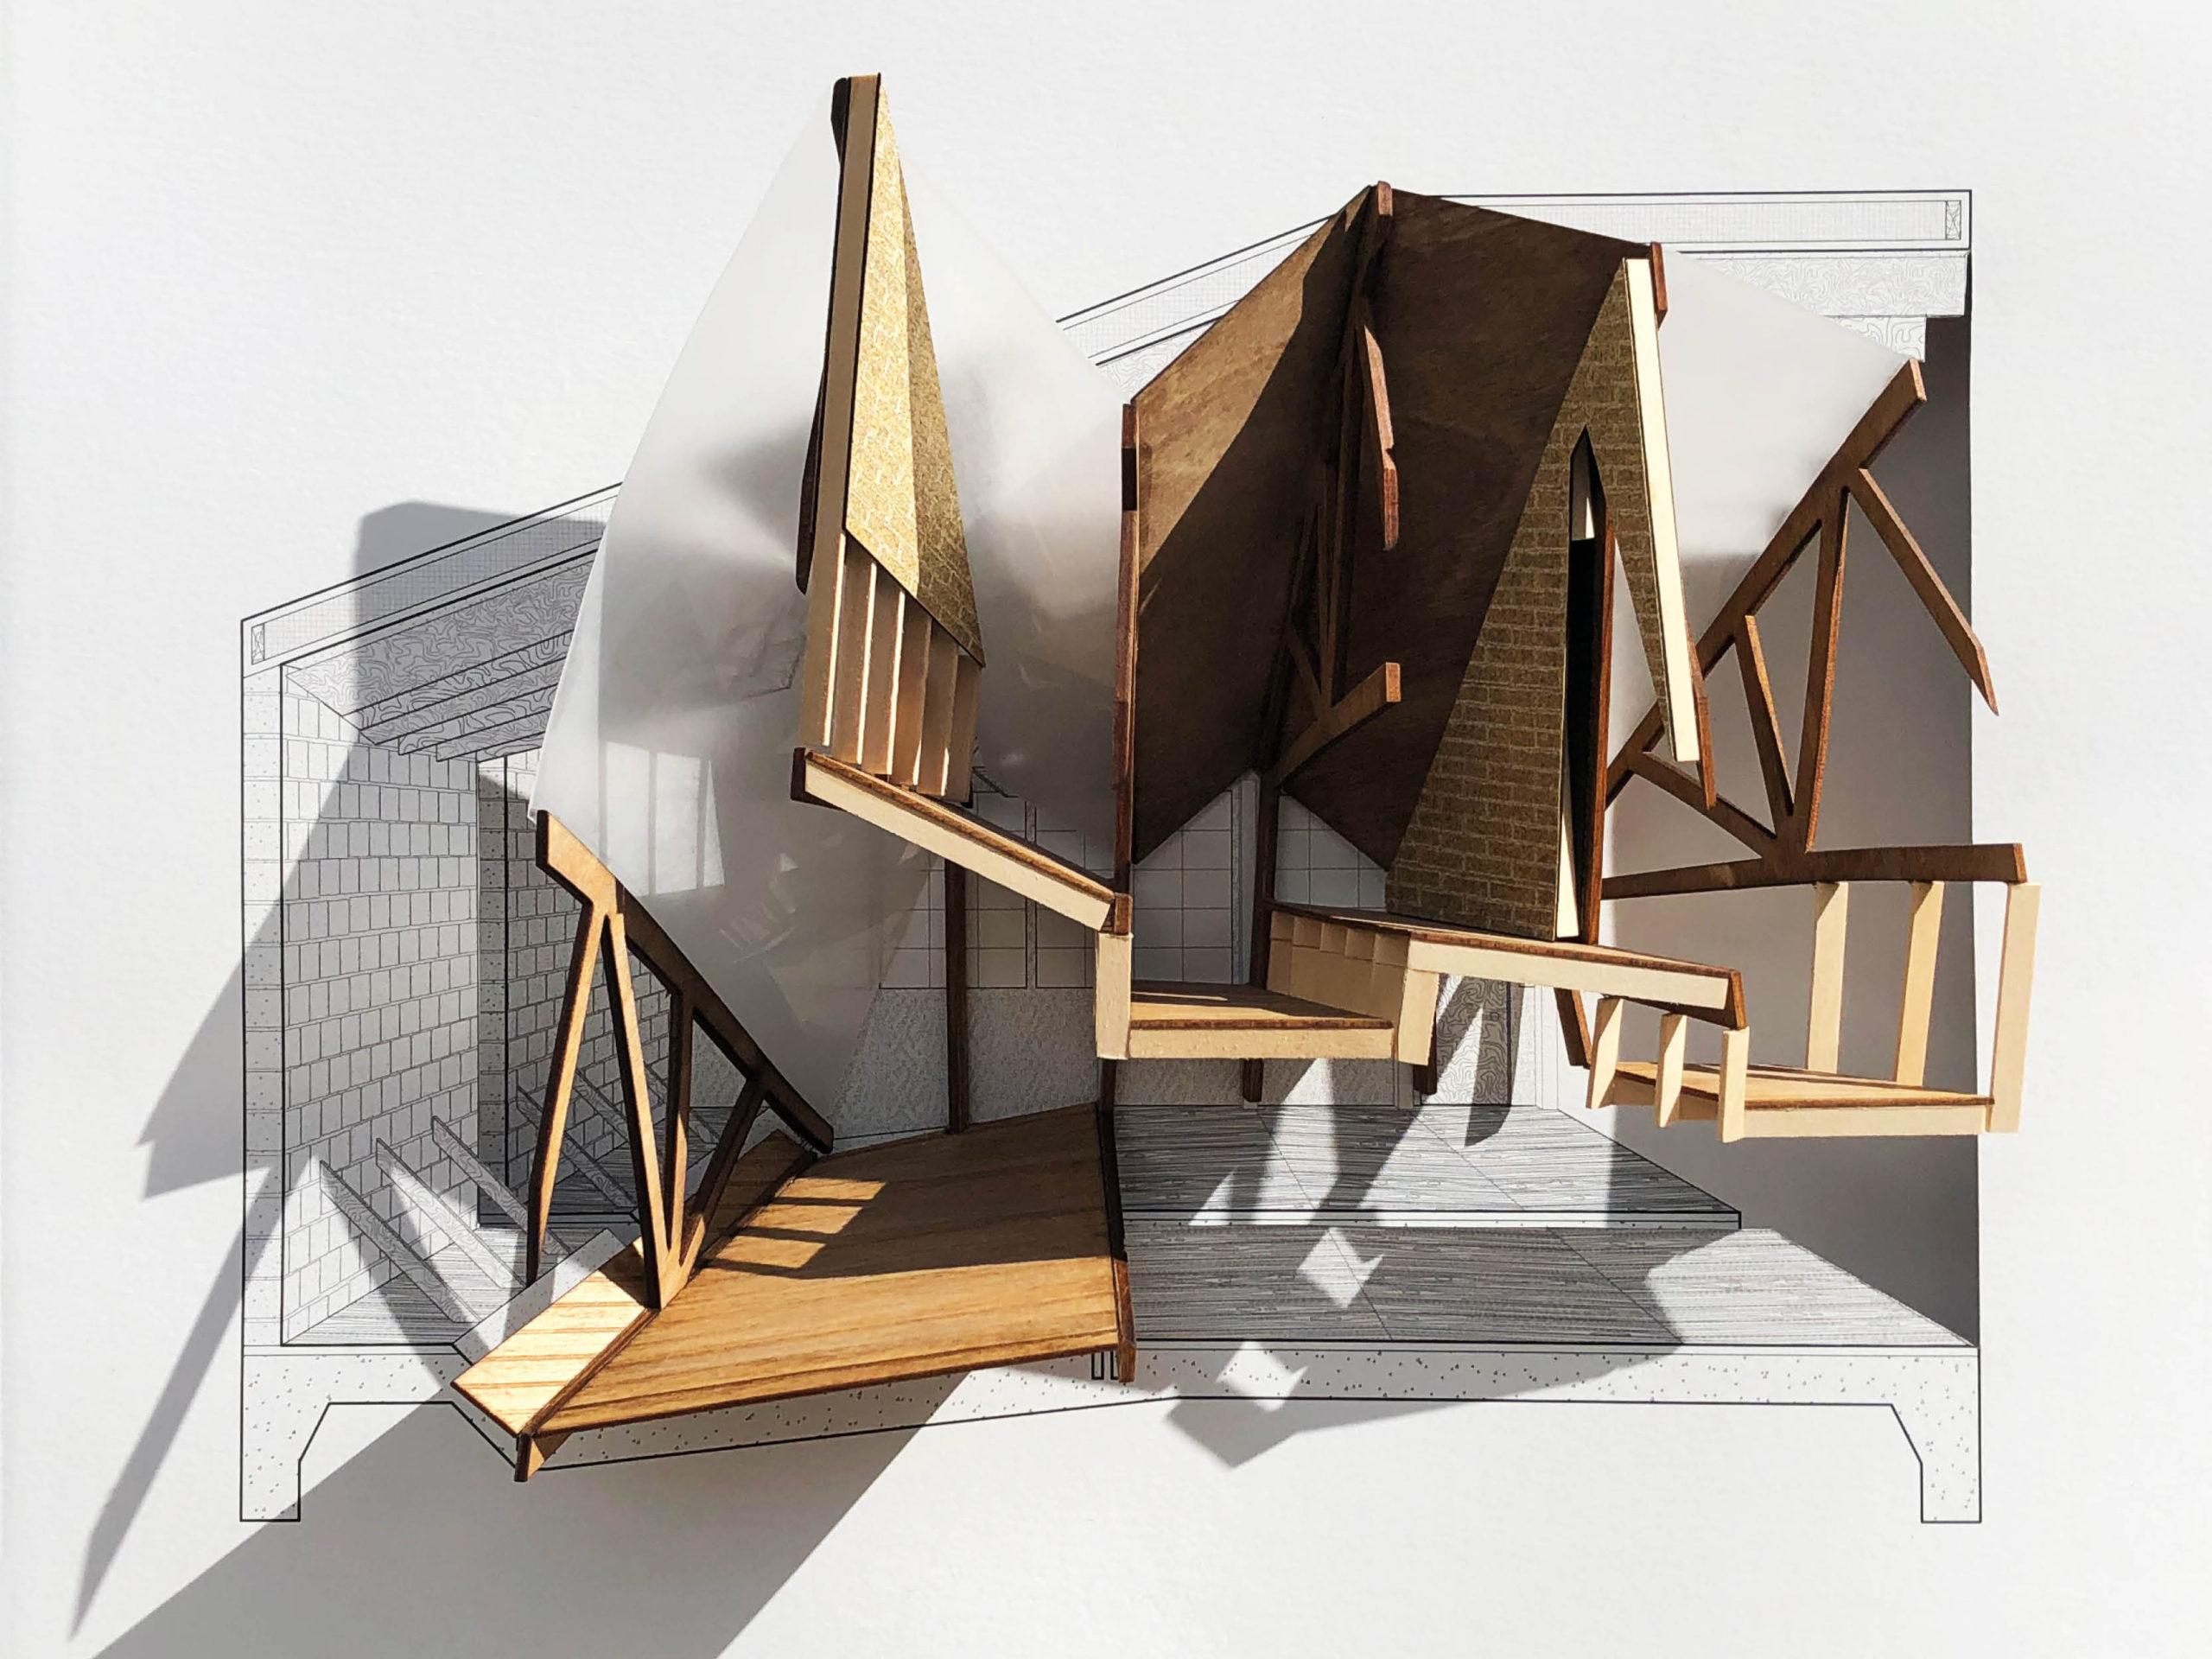 Bridging Gaps - Jose Botello-Herrera, B.Arch '23